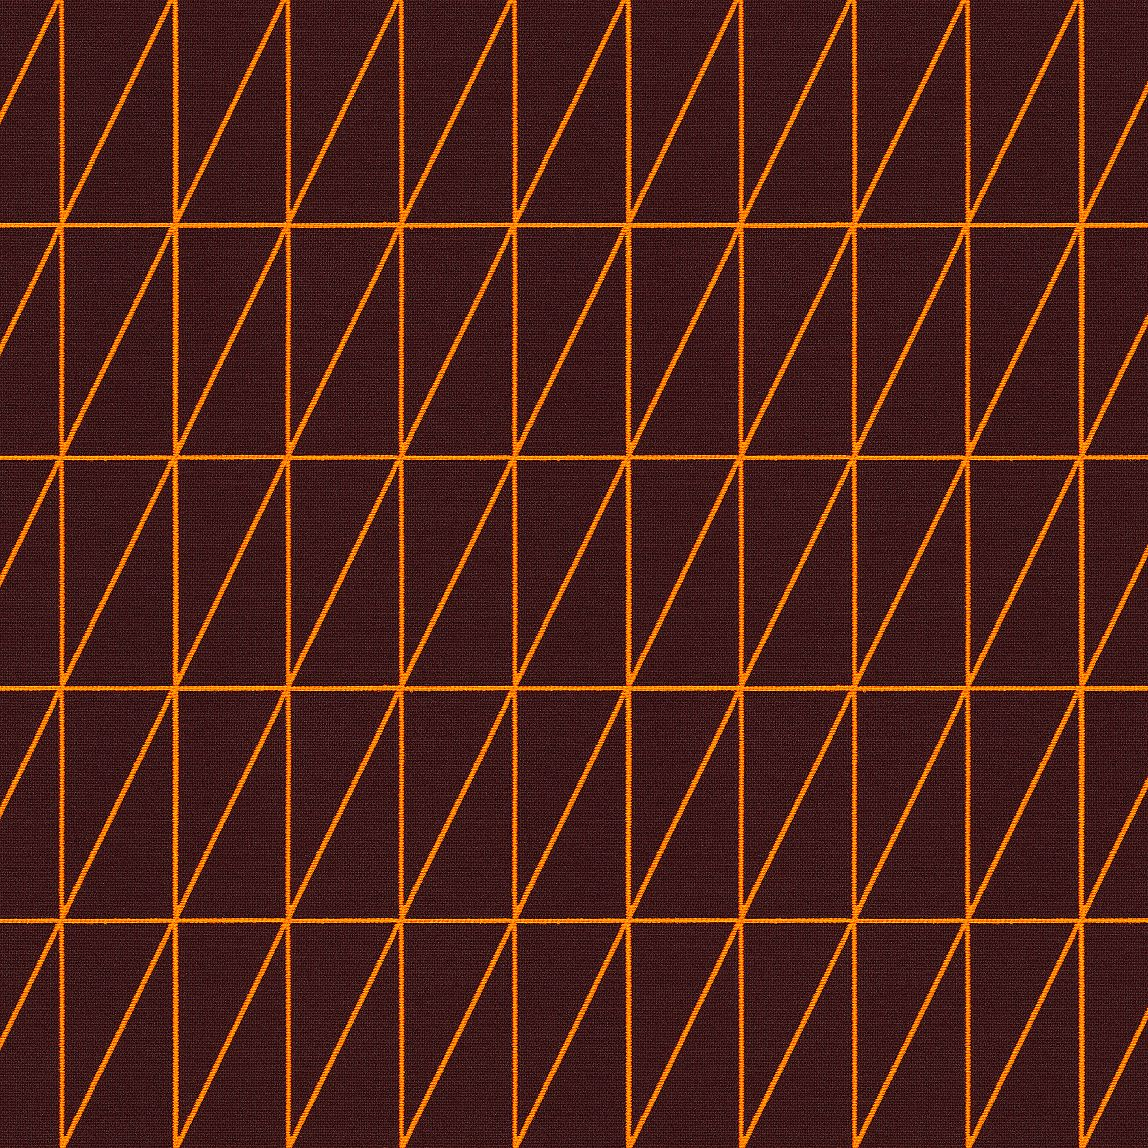 Bright Angle Tangerine Swatch